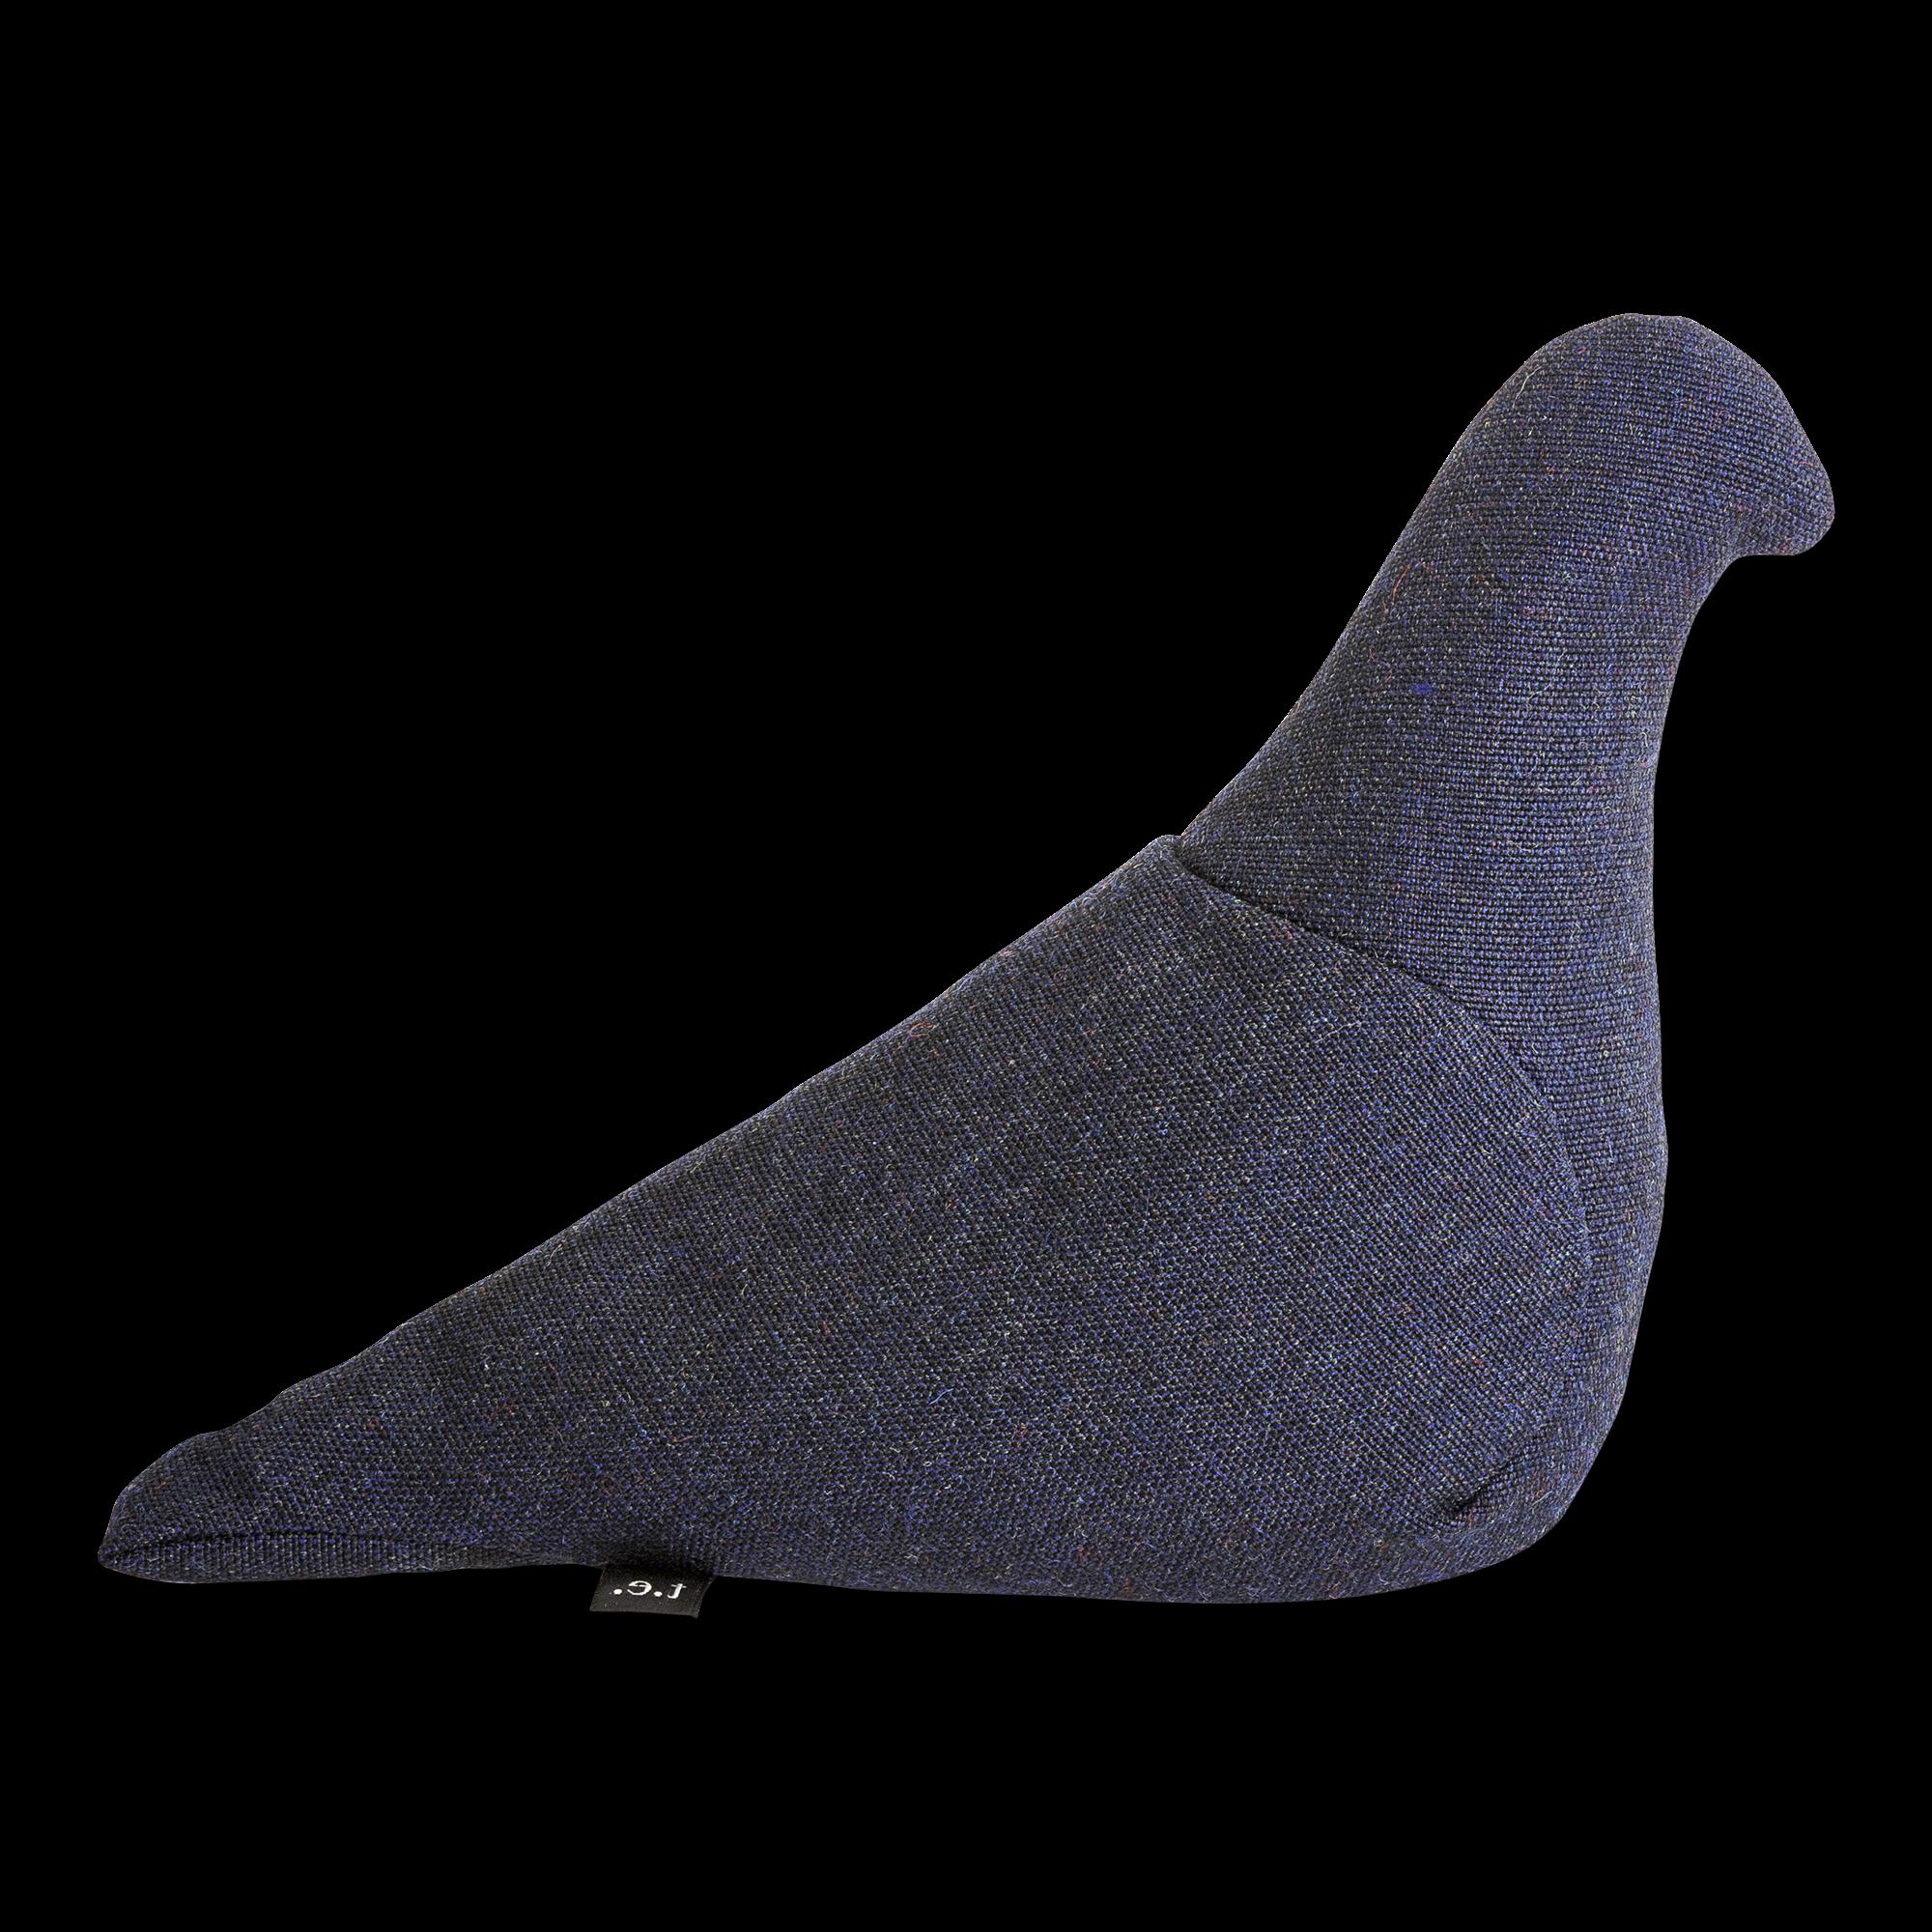 pigeon-service-44-1